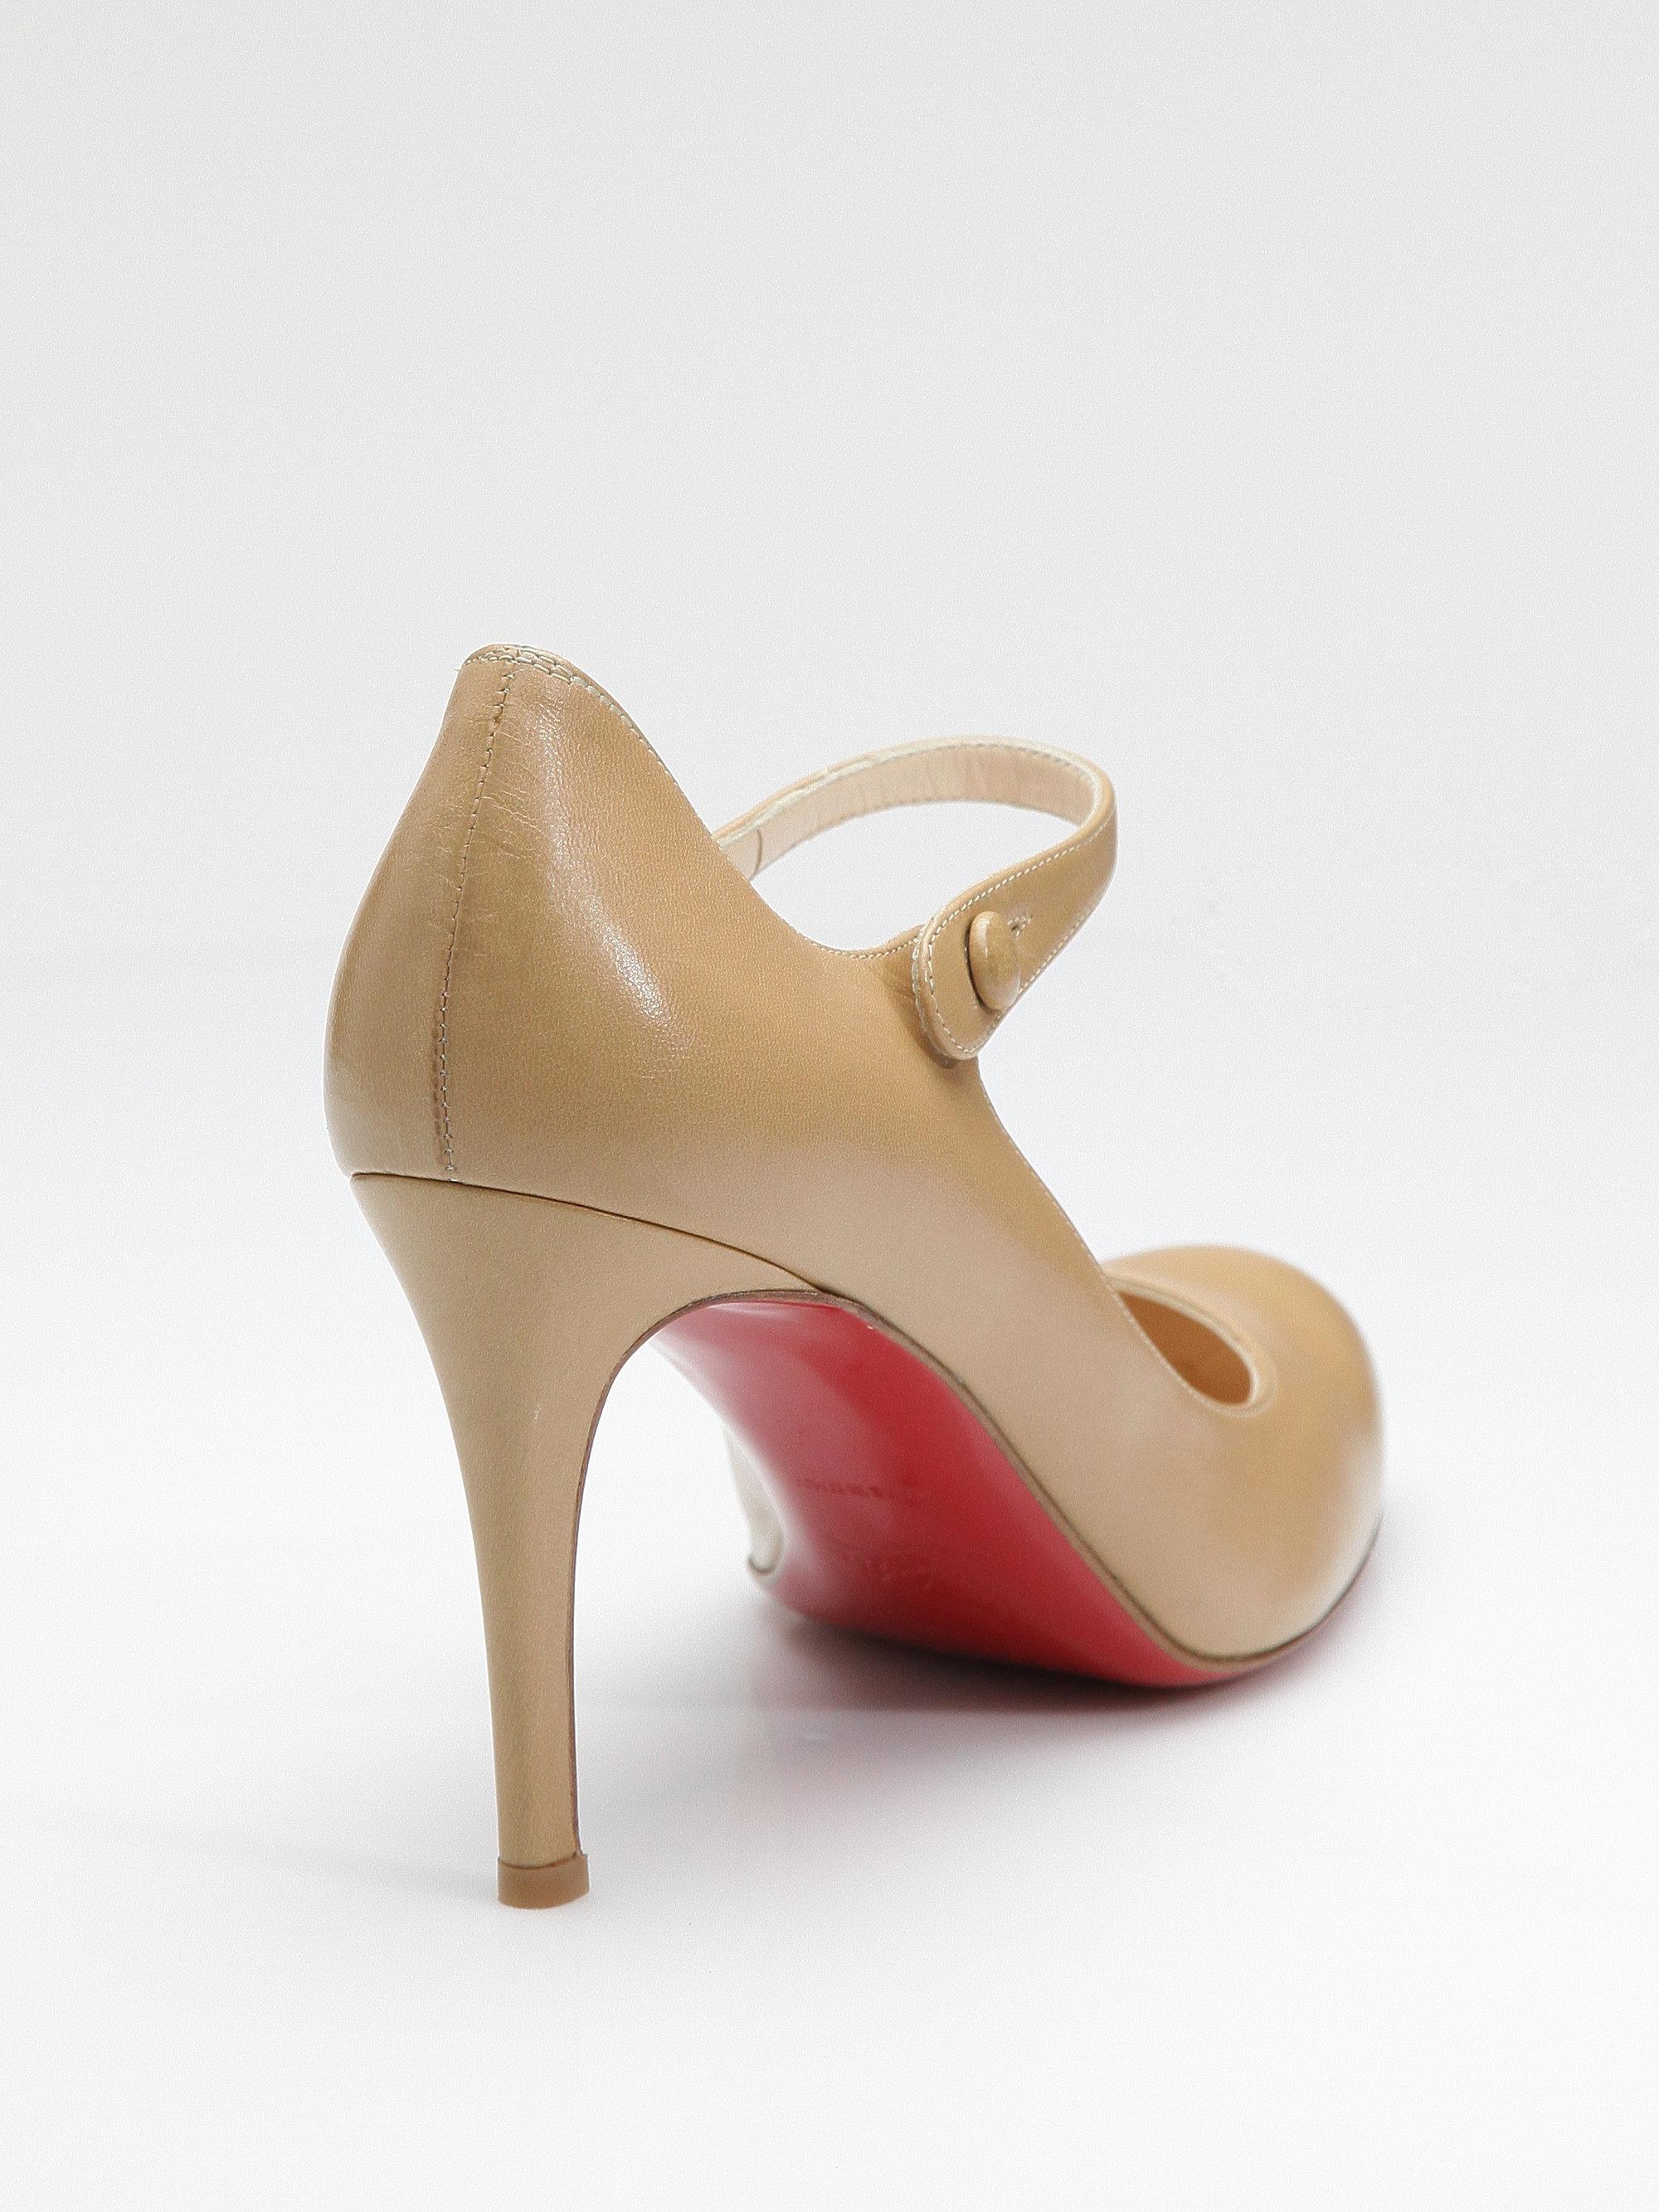 christian-louboutin-beige-corto-mary-jane-pumps-product-3-7676261-698146043.jpeg